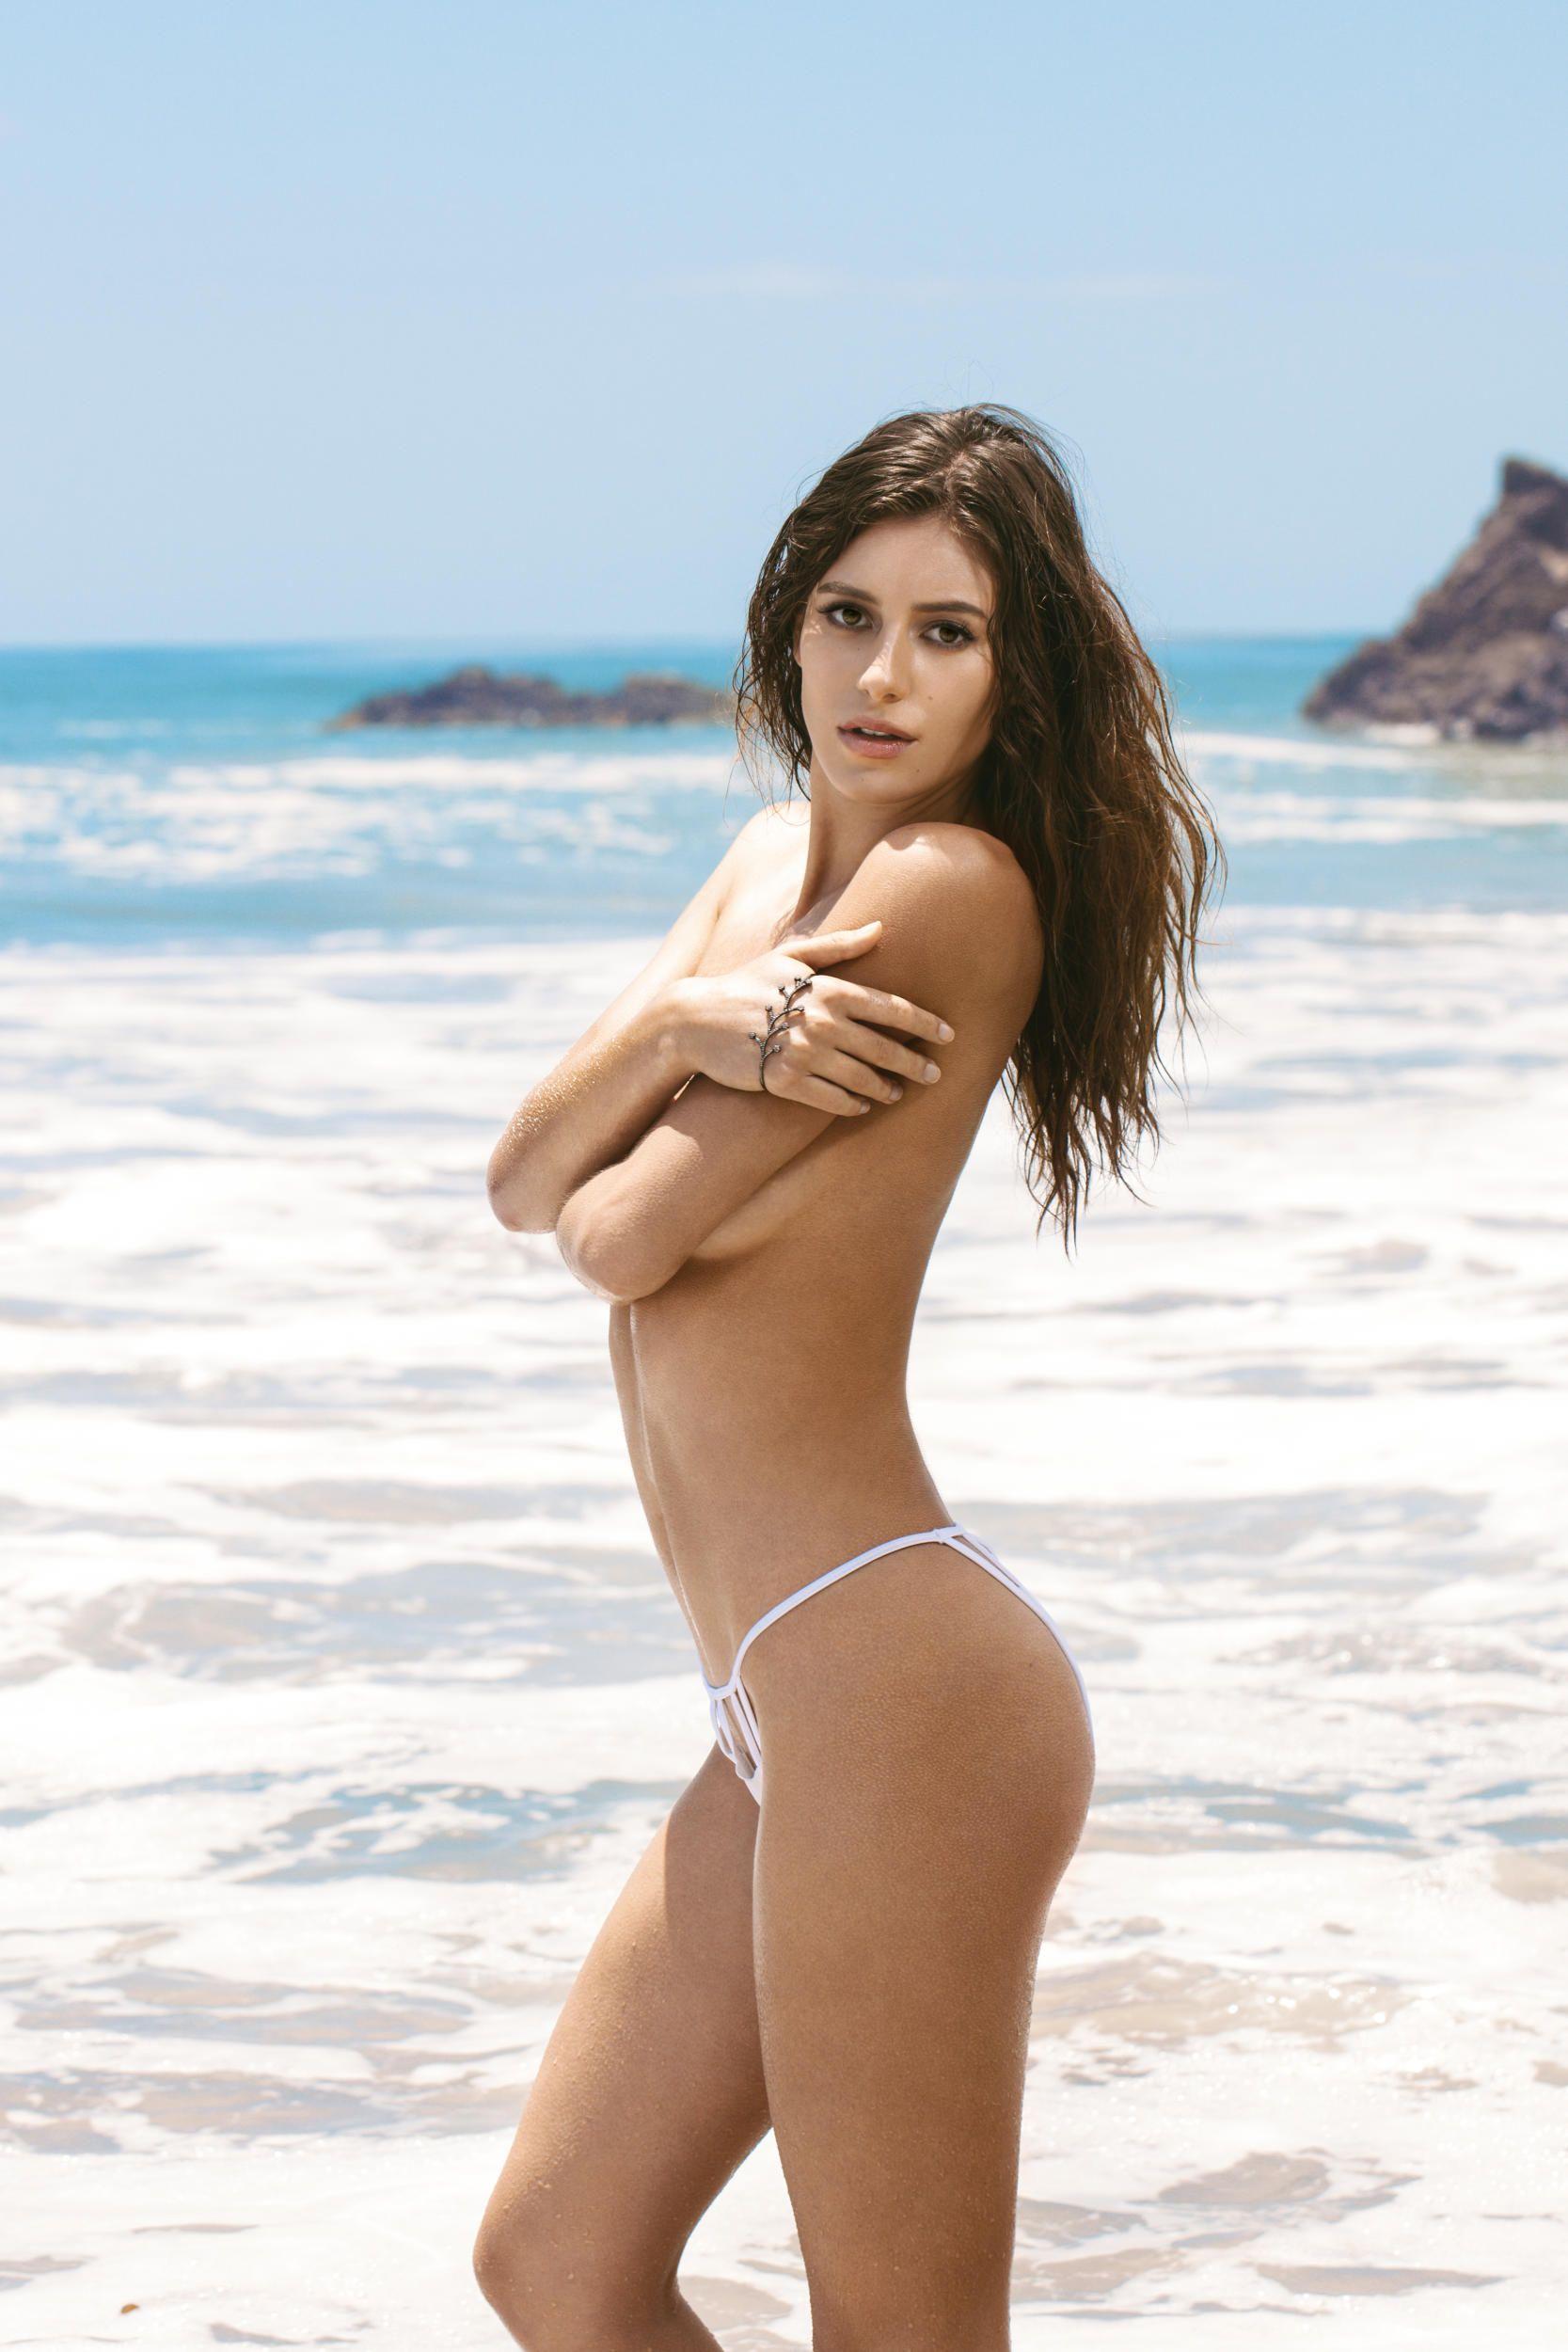 Ass Alejandra Guilmant nudes (97 foto and video), Ass, Paparazzi, Feet, in bikini 2018